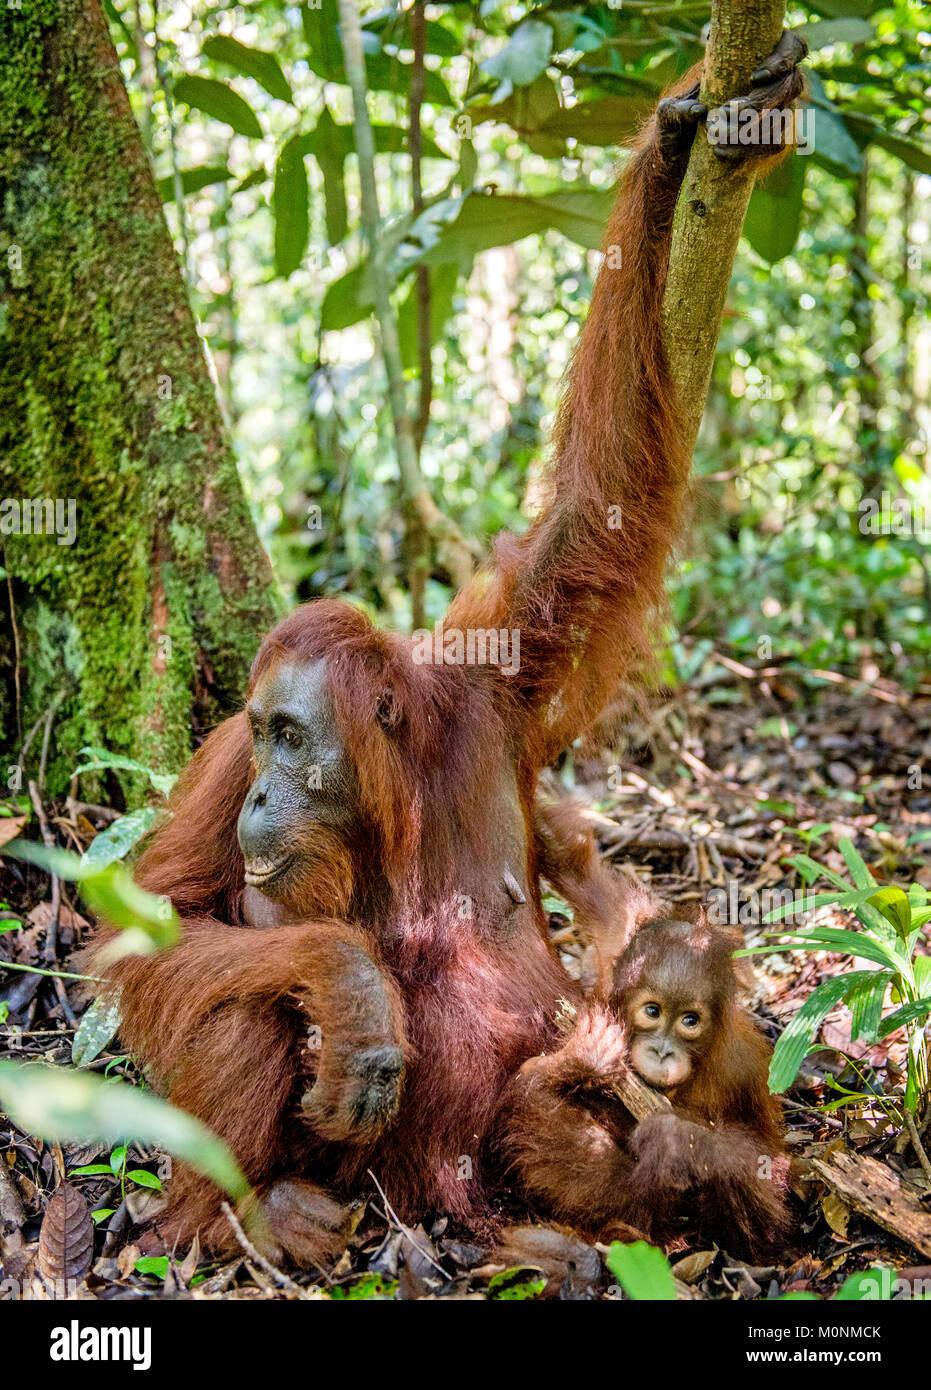 Orangutan baby and mother. Mother and cub in a natural habitat. Bornean orangutan (Pongo  pygmaeus wurmbii) in the - Stock Image